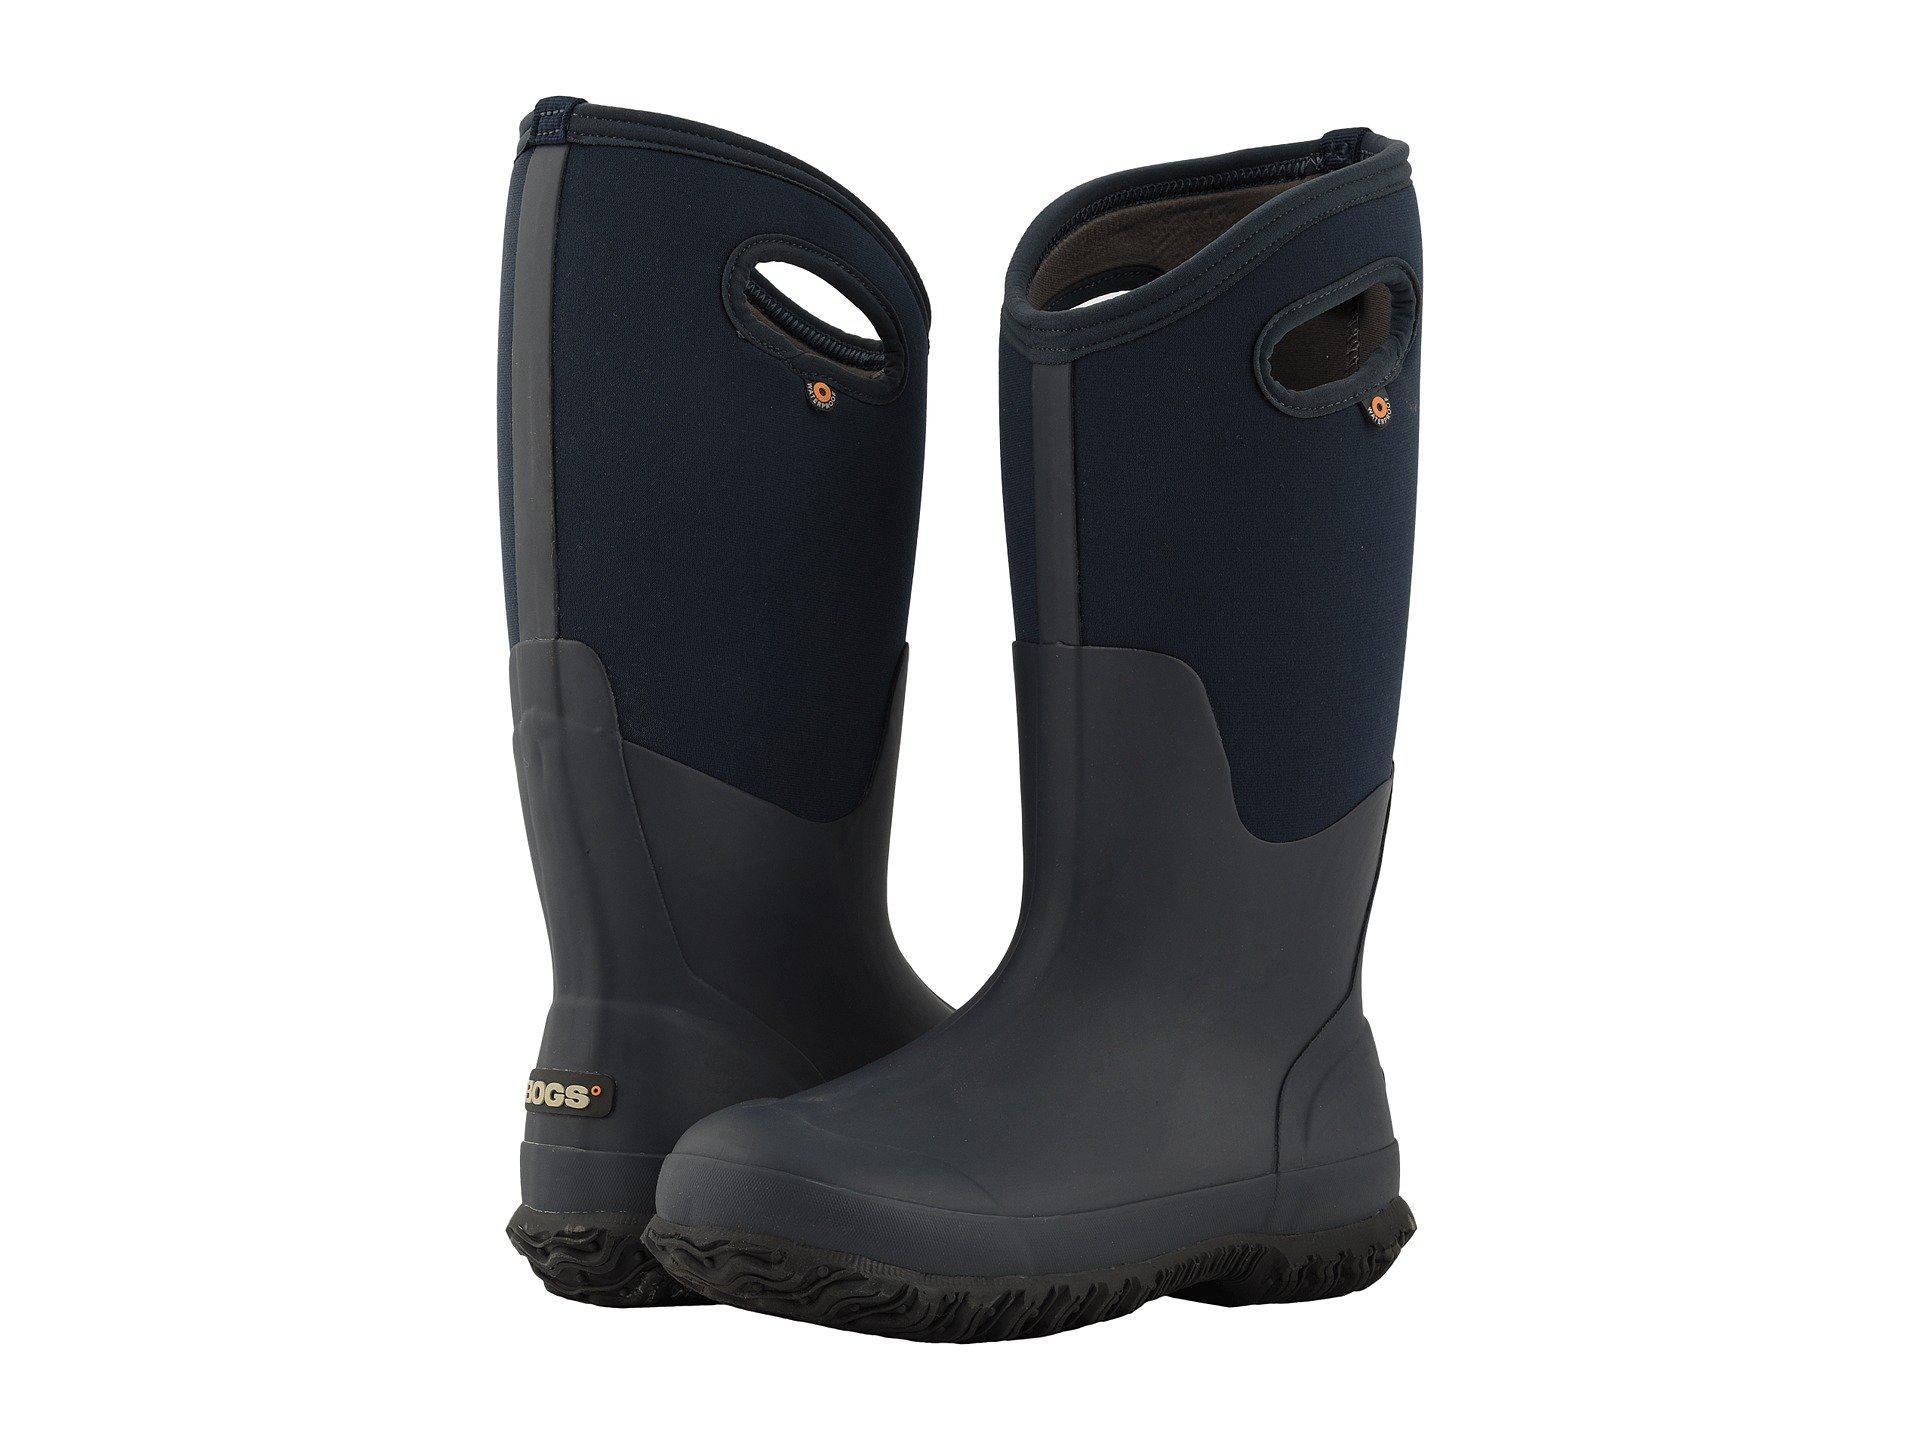 9a30d24522f4 Lyst - Bogs Classic Tall Matte (Eggplant) Women s Rain Boots in Blue ...